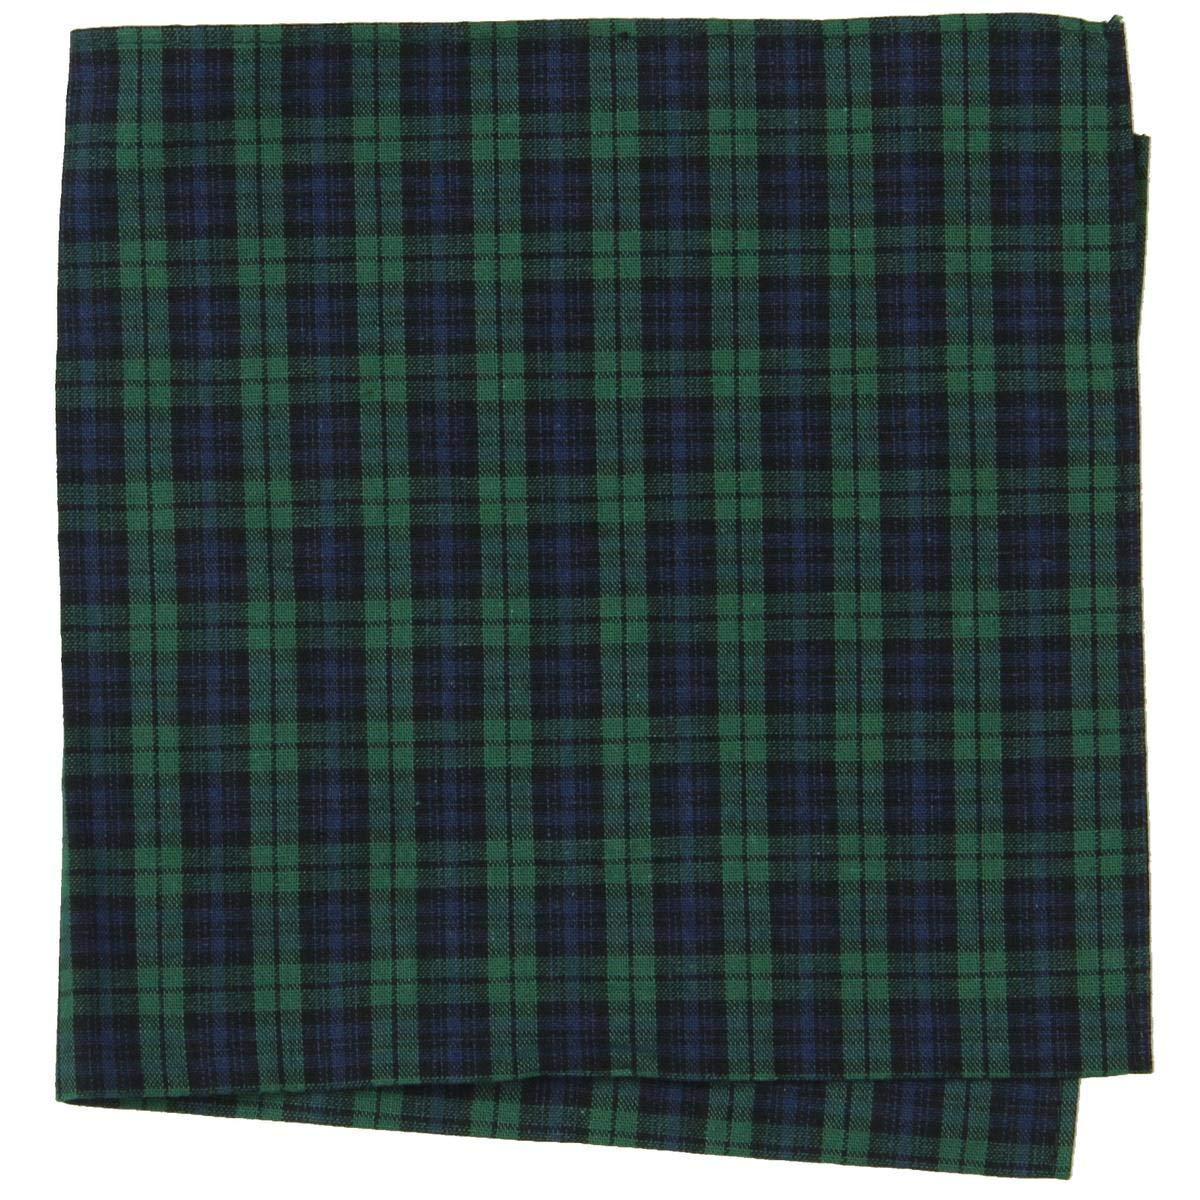 Tommy Hilfiger Mens Tartan Plaid Everyday Pocket Square Green O/S